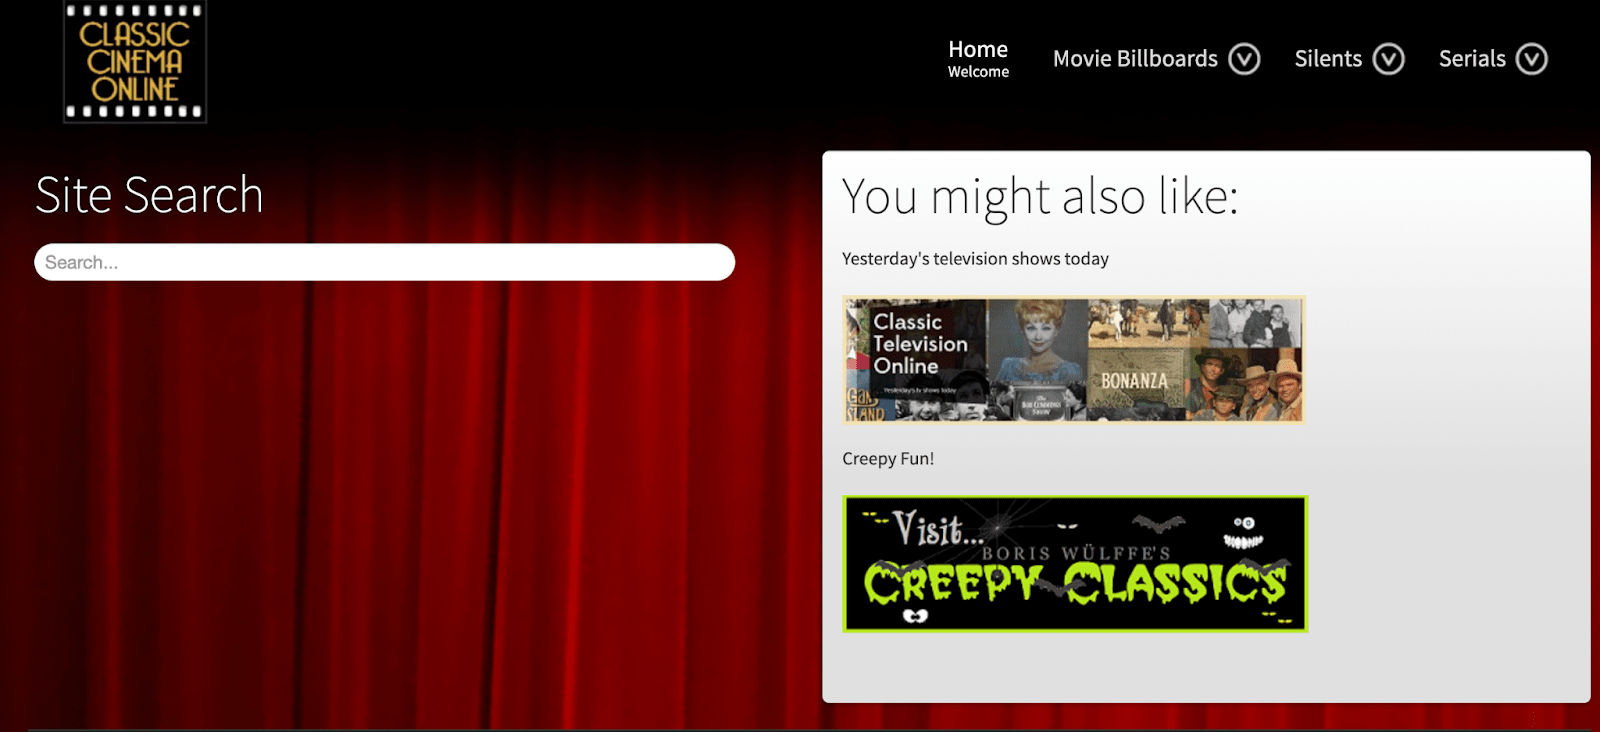 Classic Cinema Online banner